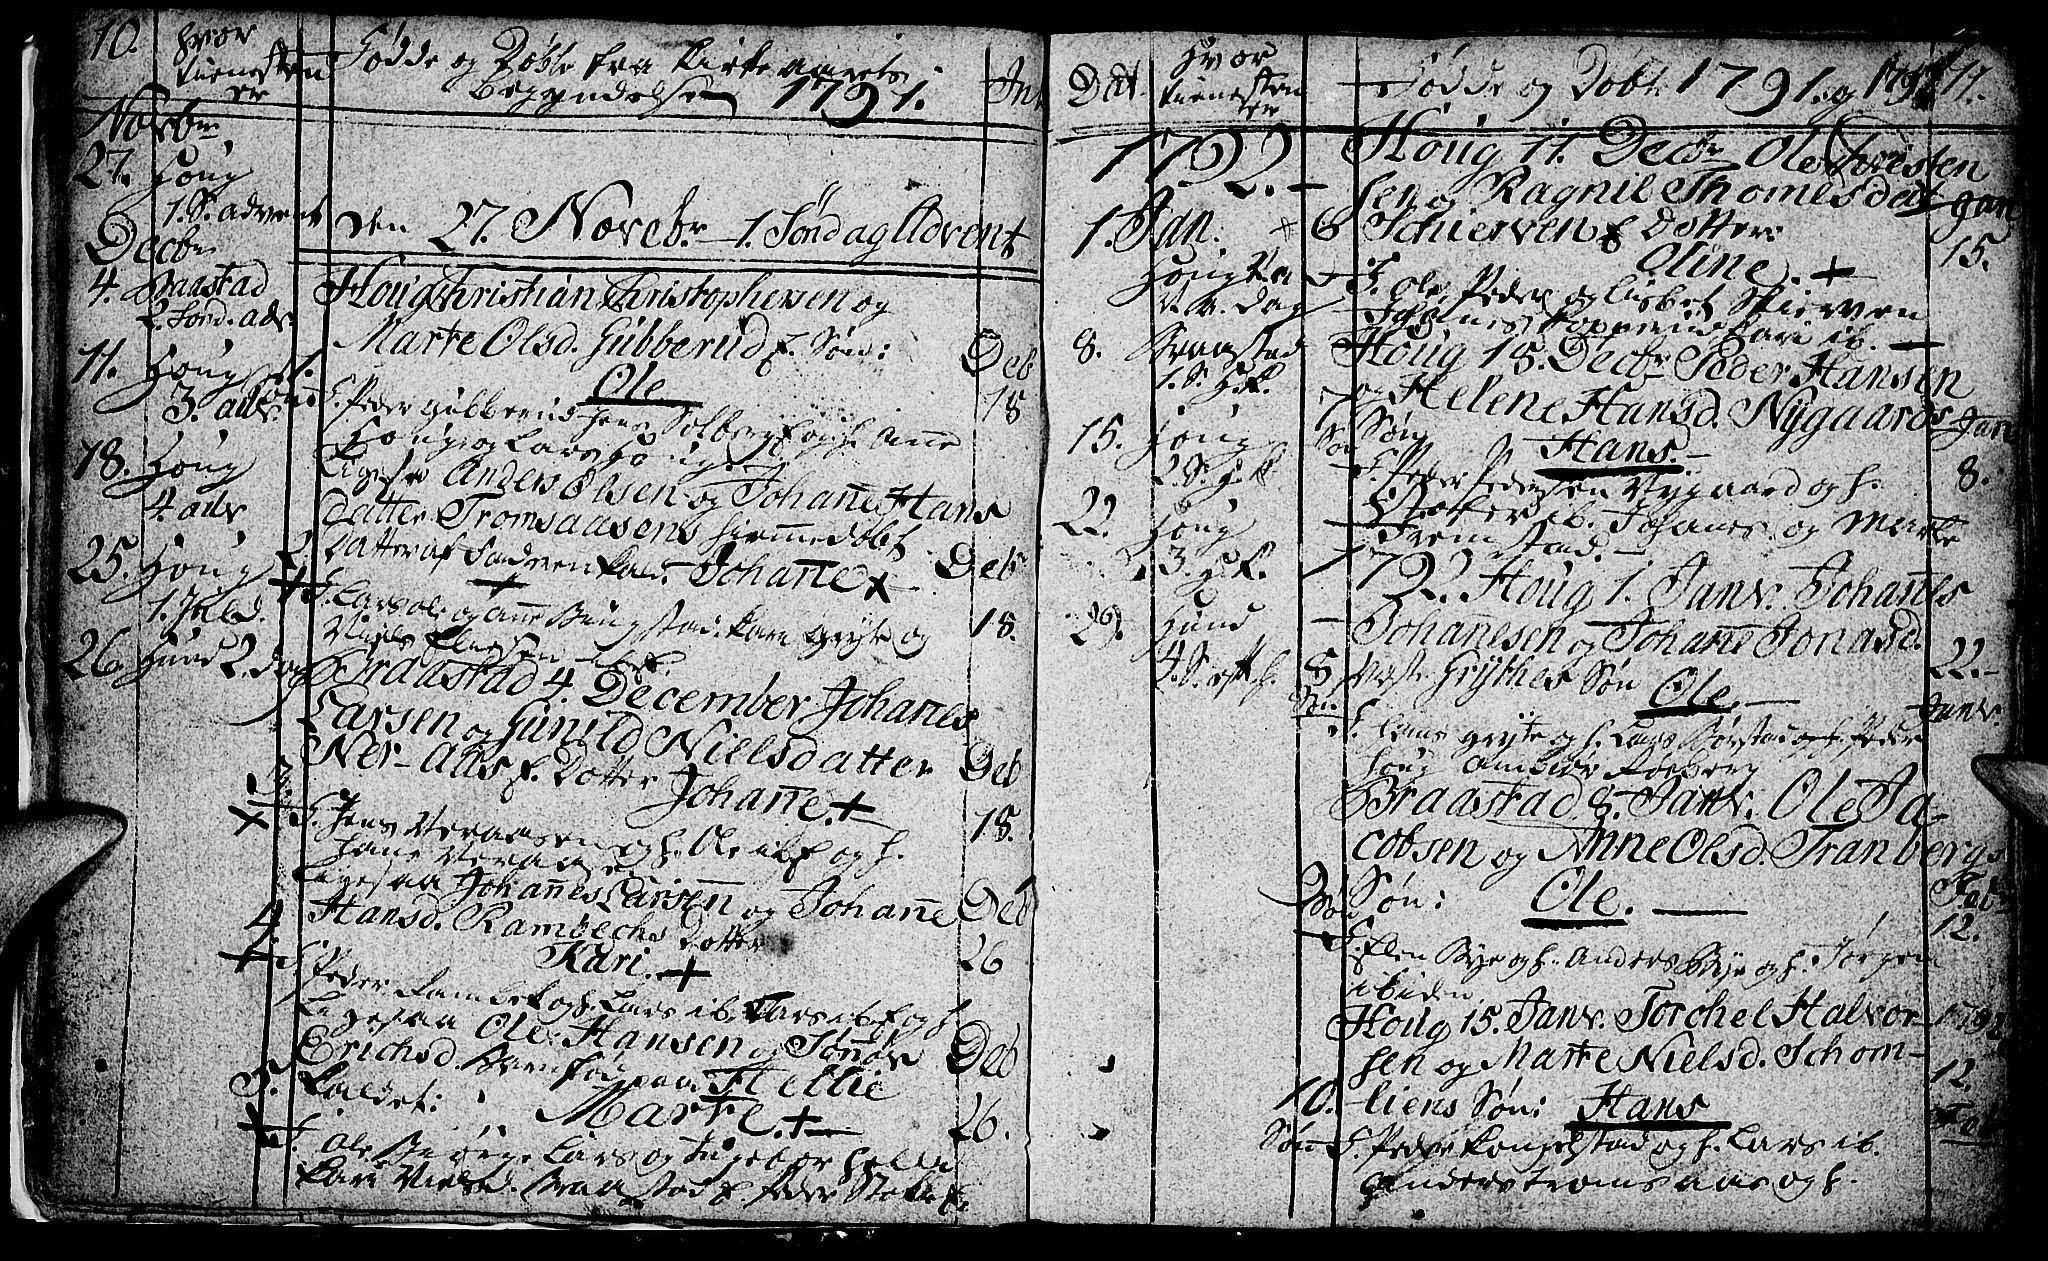 SAH, Vardal prestekontor, H/Ha/Hab/L0002: Klokkerbok nr. 2, 1790-1803, s. 10-11